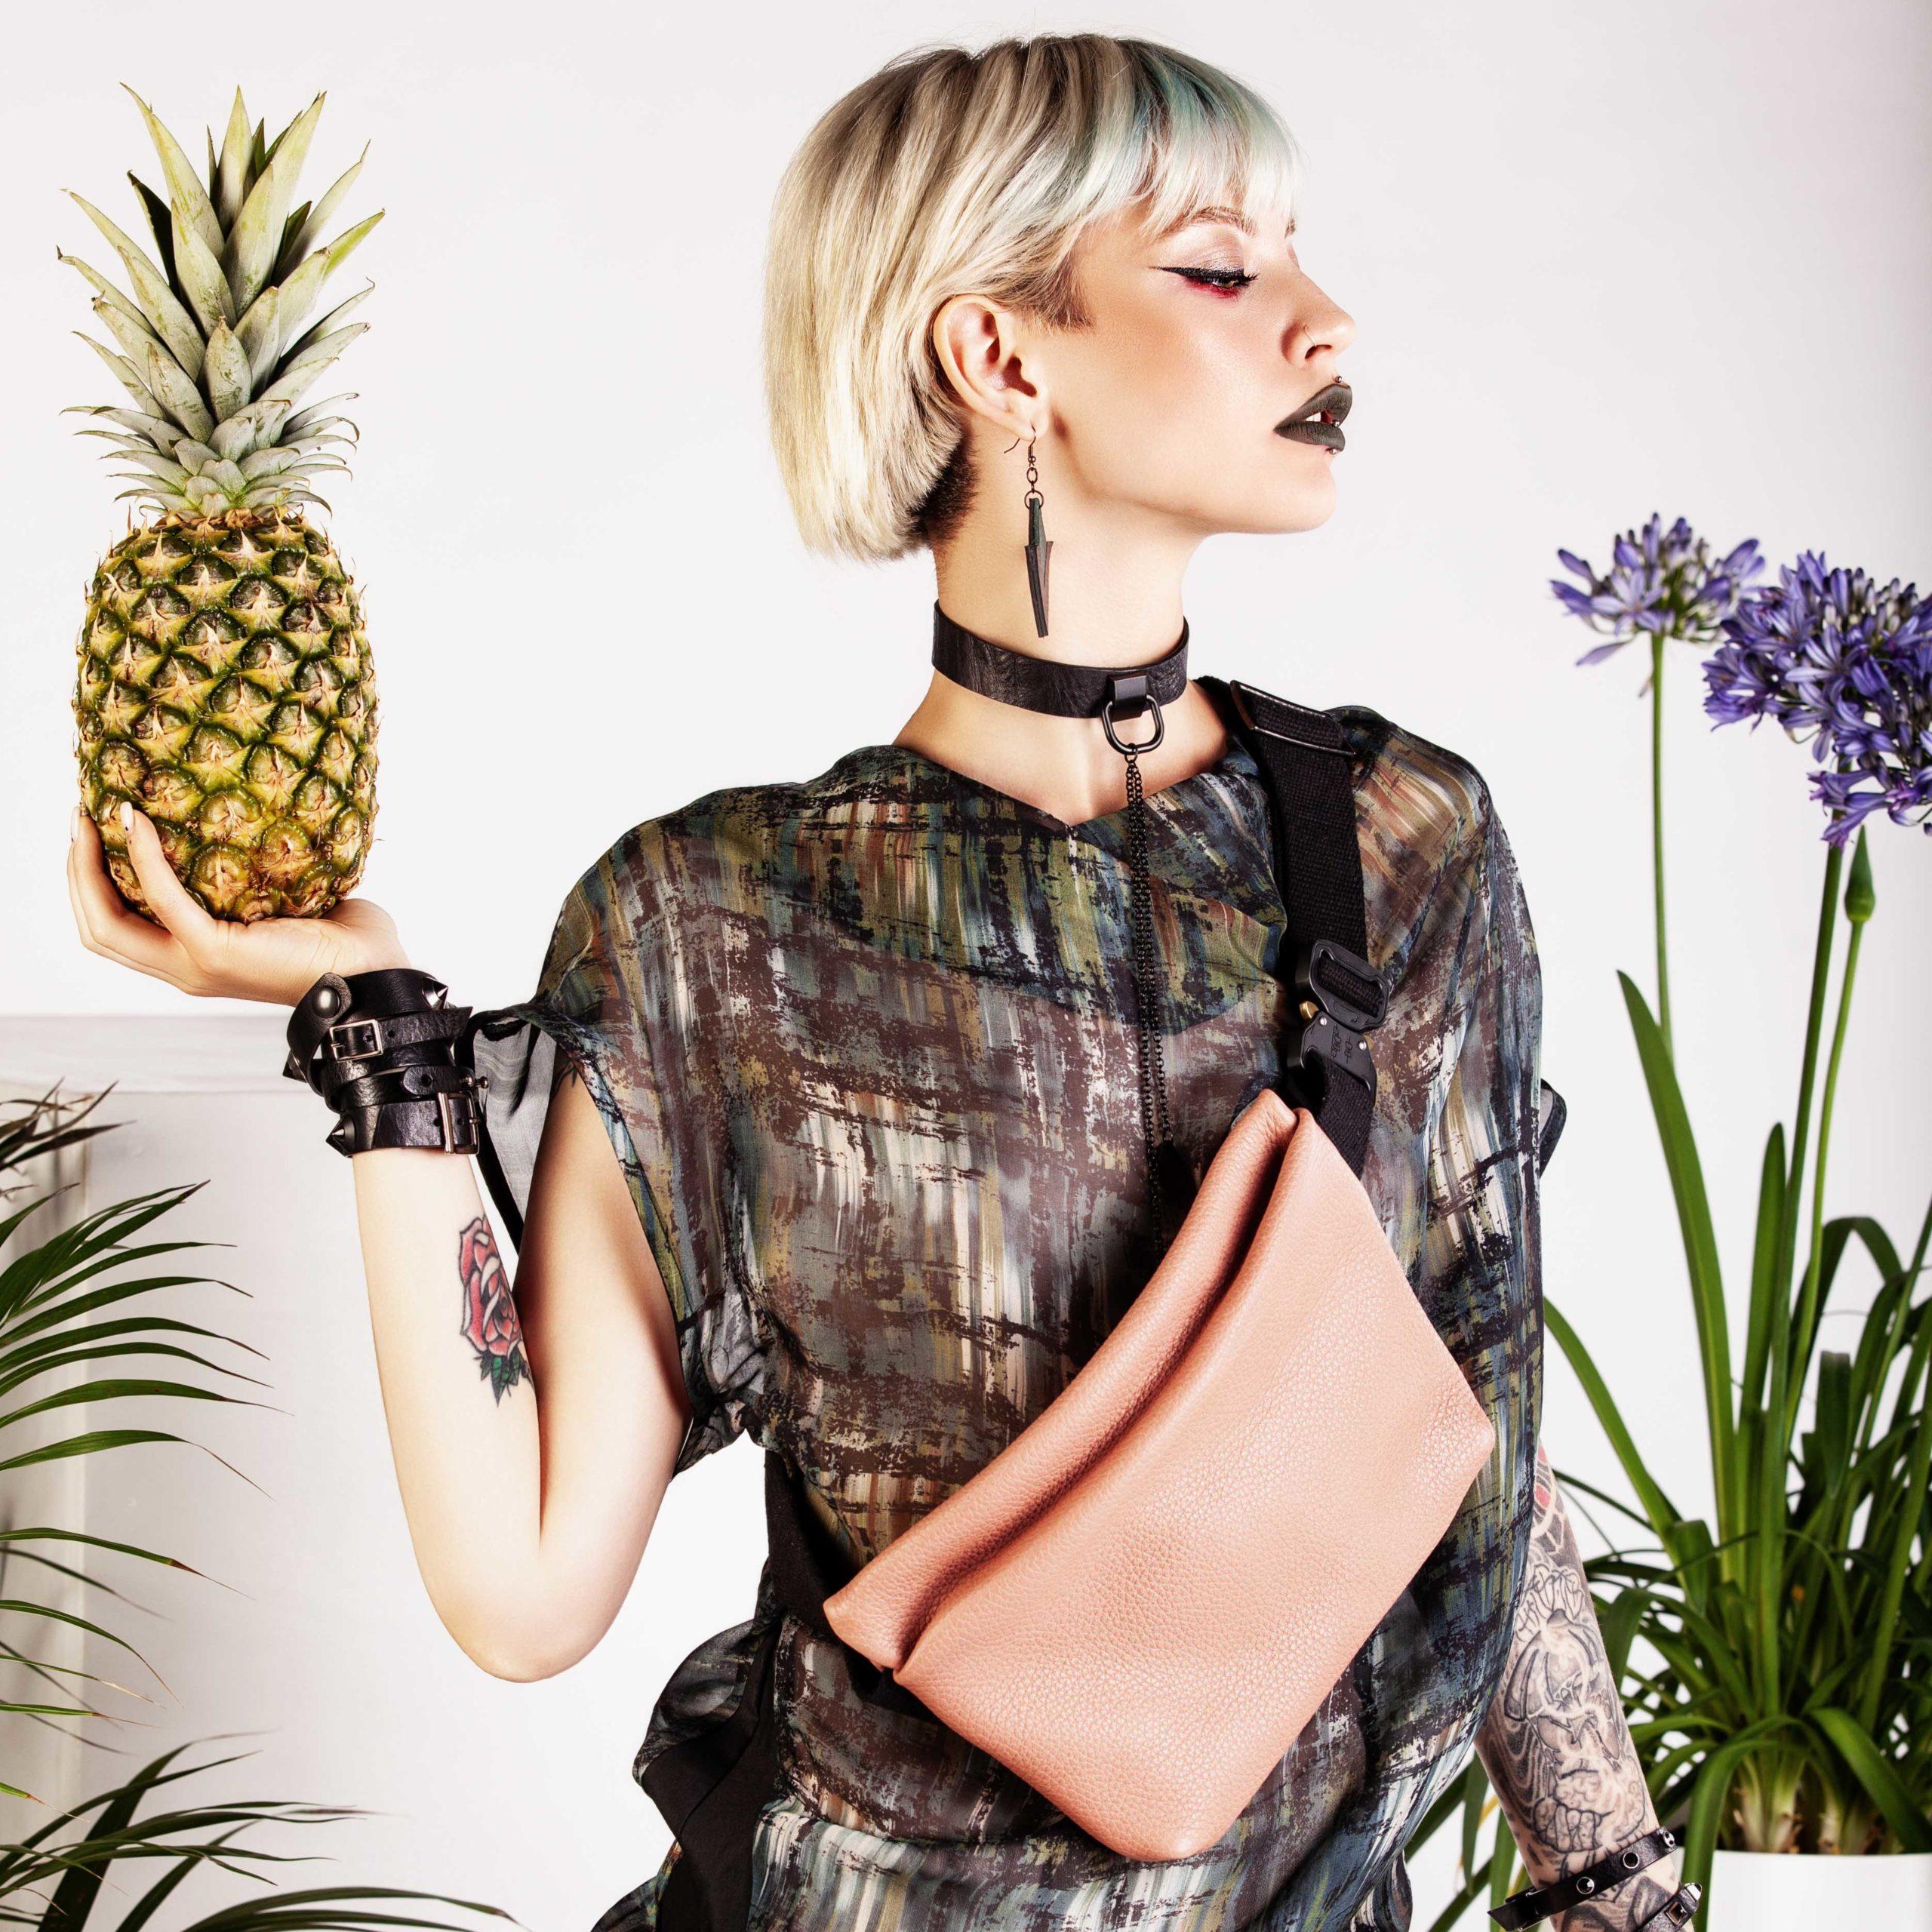 #ANDRÀ TUTTO BENE - Spotify playlist by Cinzia Rossi